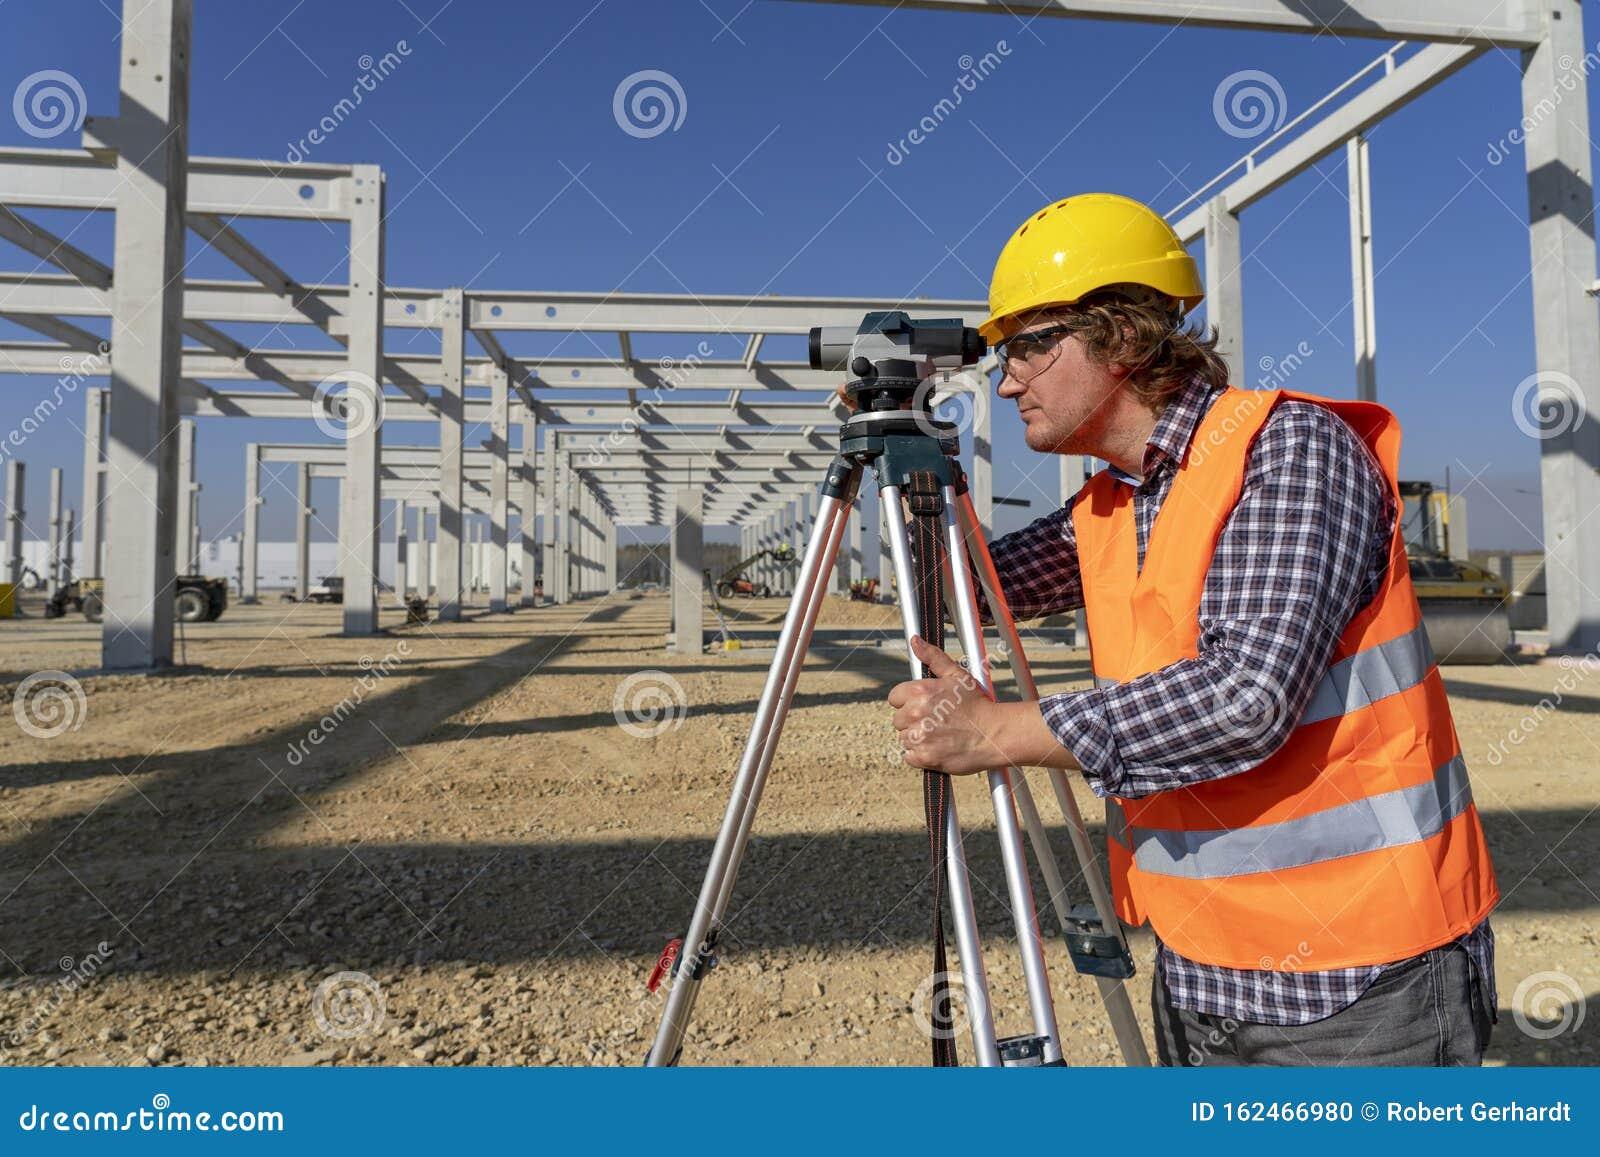 recherche homme construction femme riche cherche homme cameroun